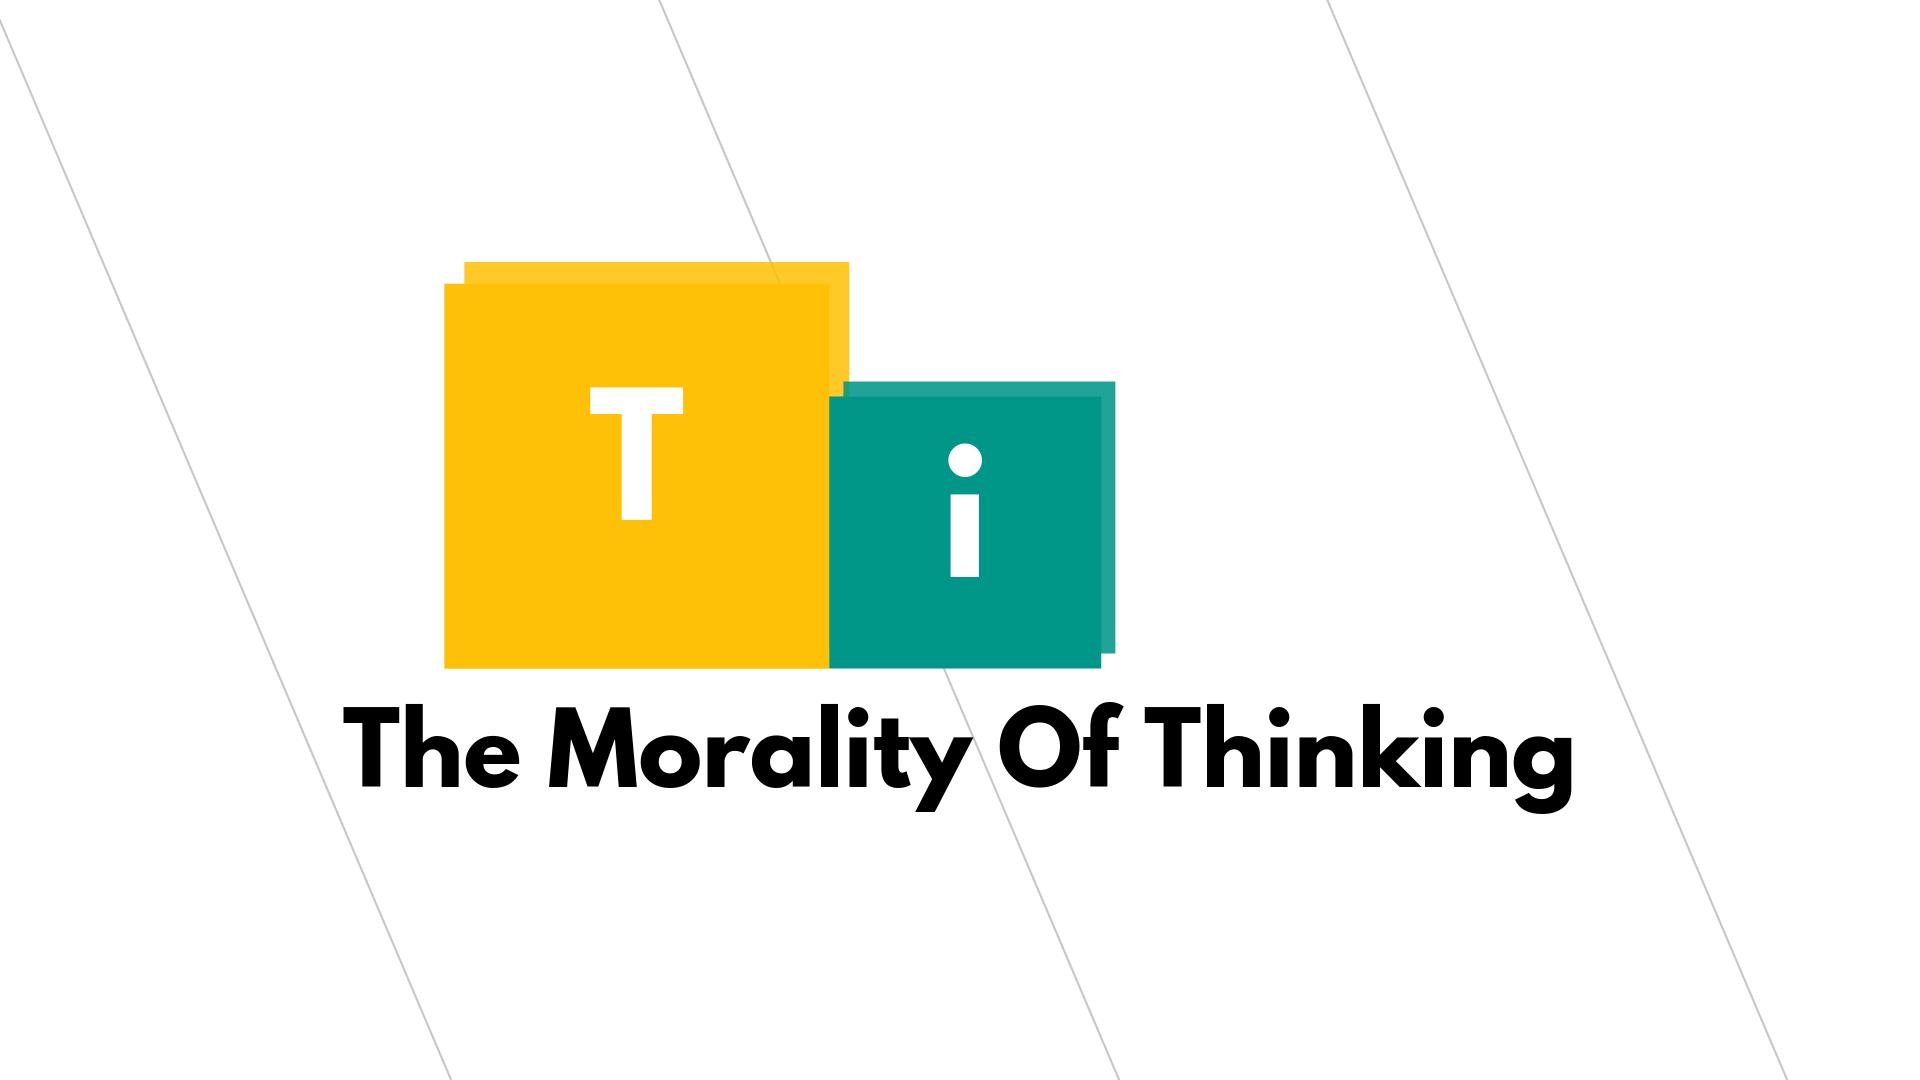 Thinking morality,